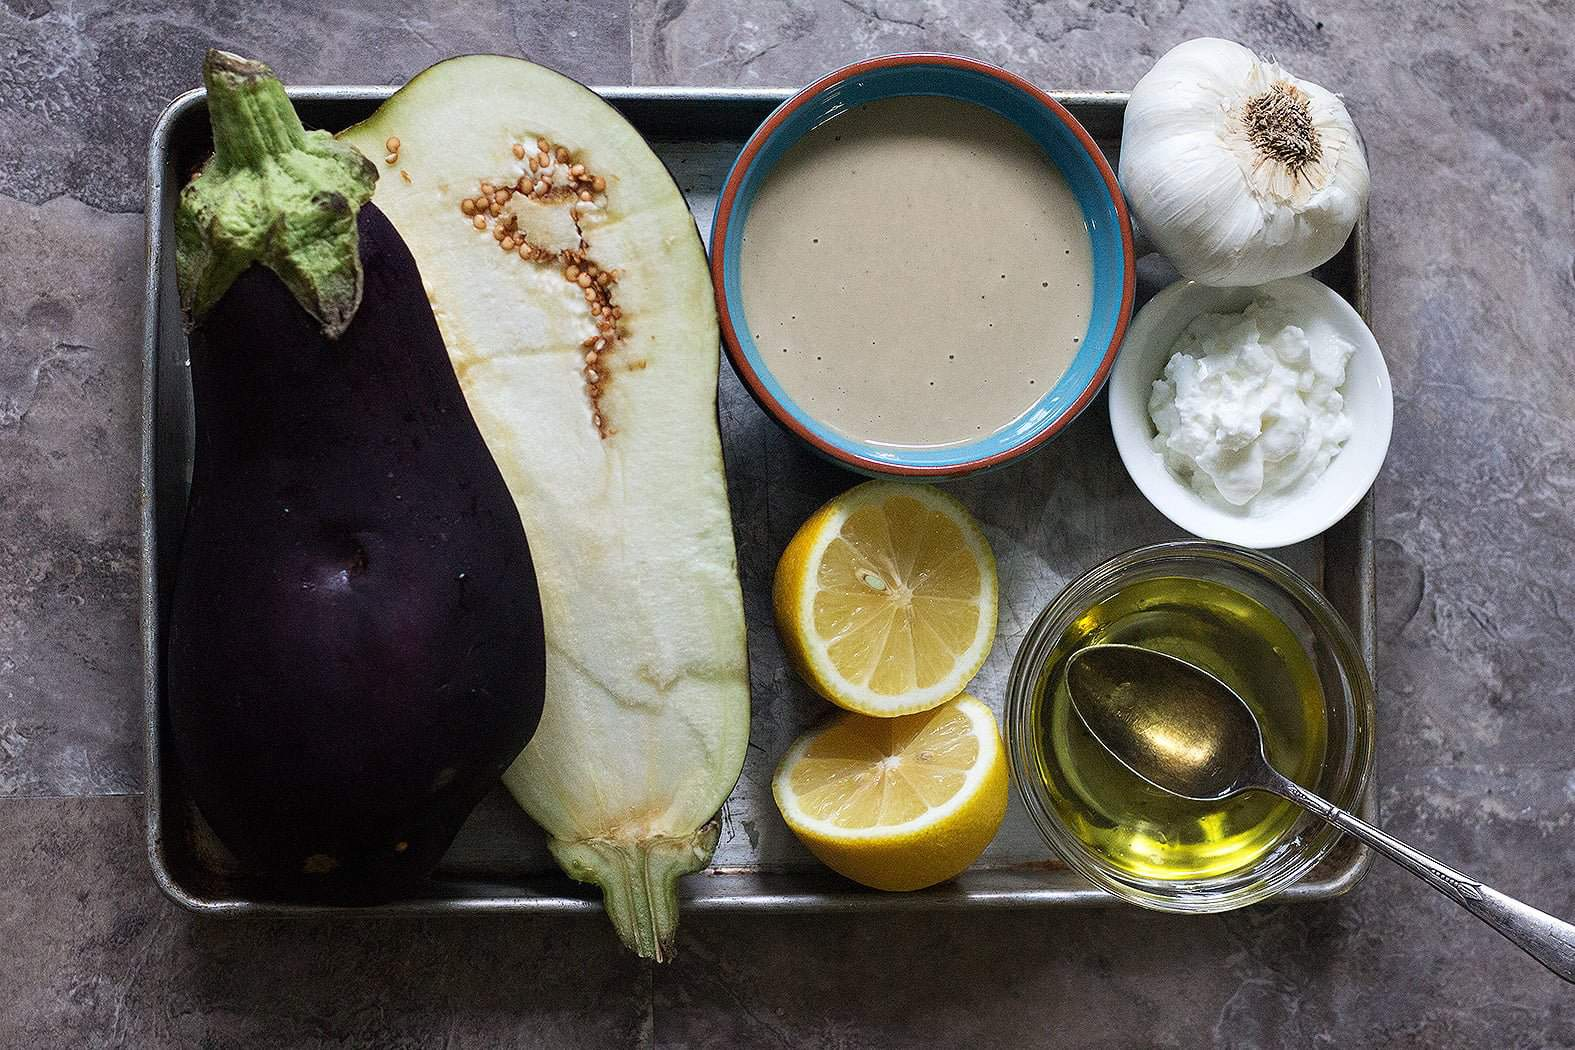 Baba Ganoush ingredients are eggplants, tahini, garlic, yogurt, lemon juice and olive oil.